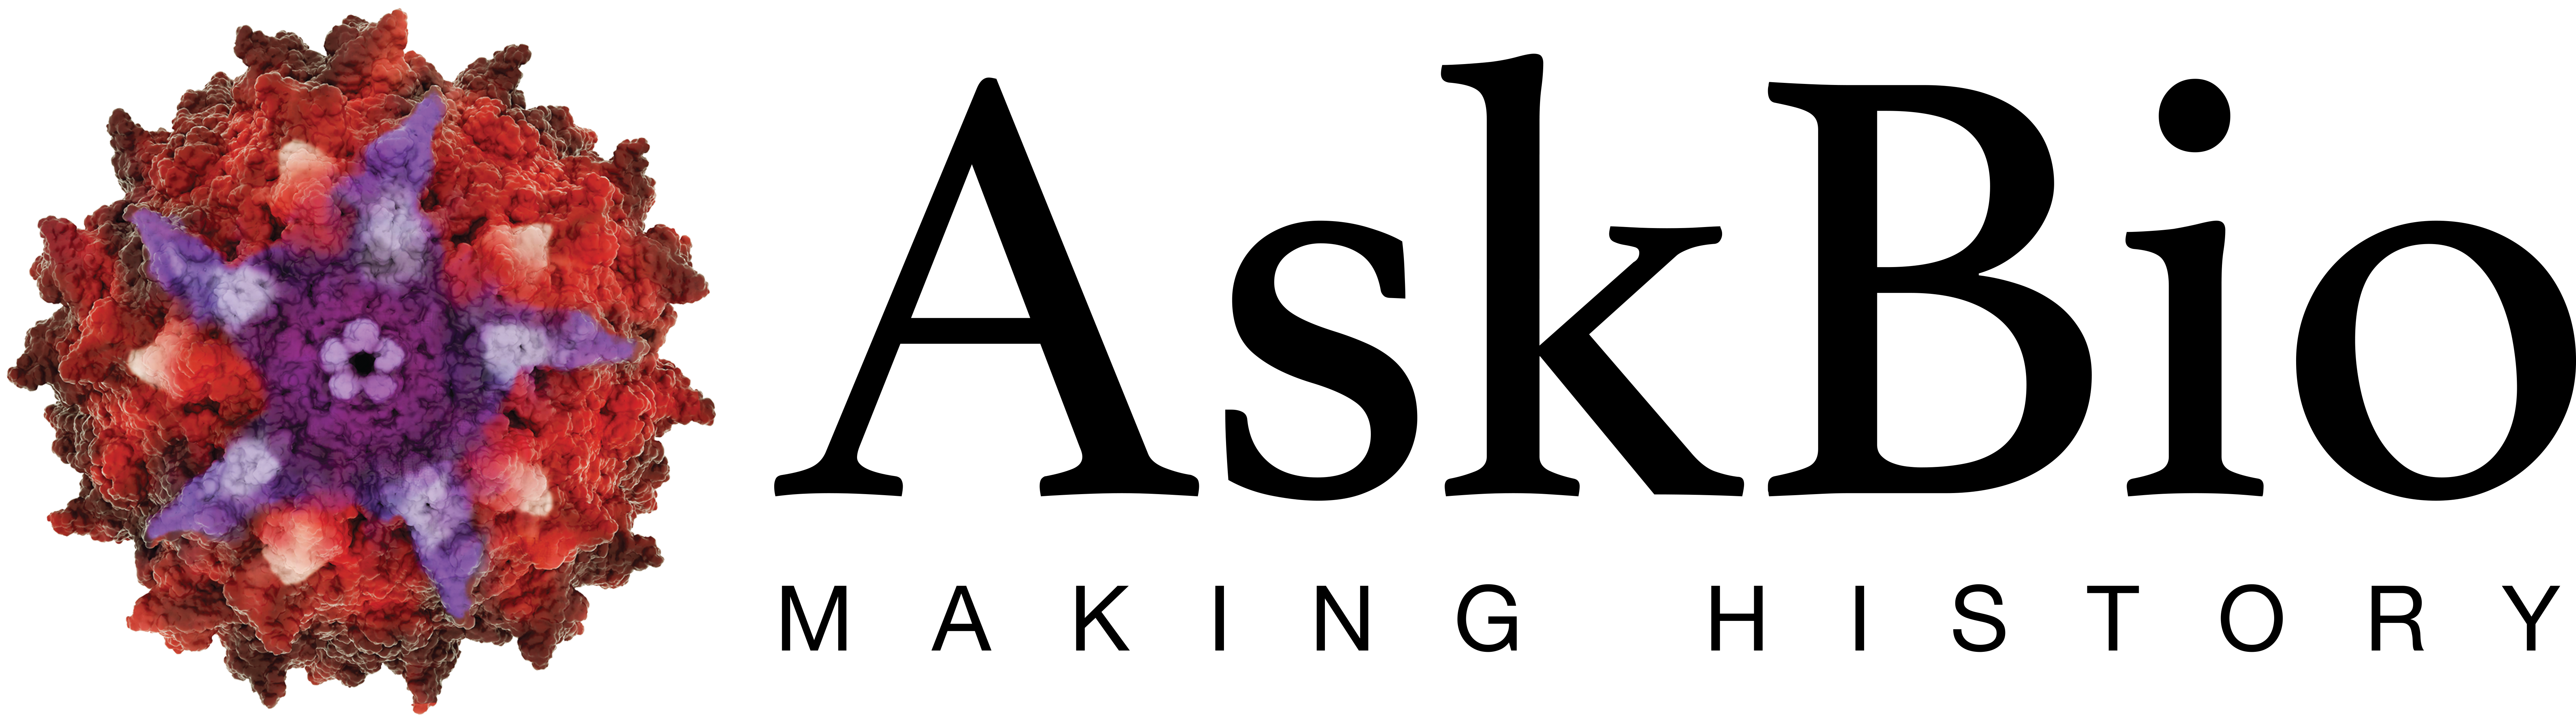 Asklepios BioPharmaceutical, Inc. (AskBio)